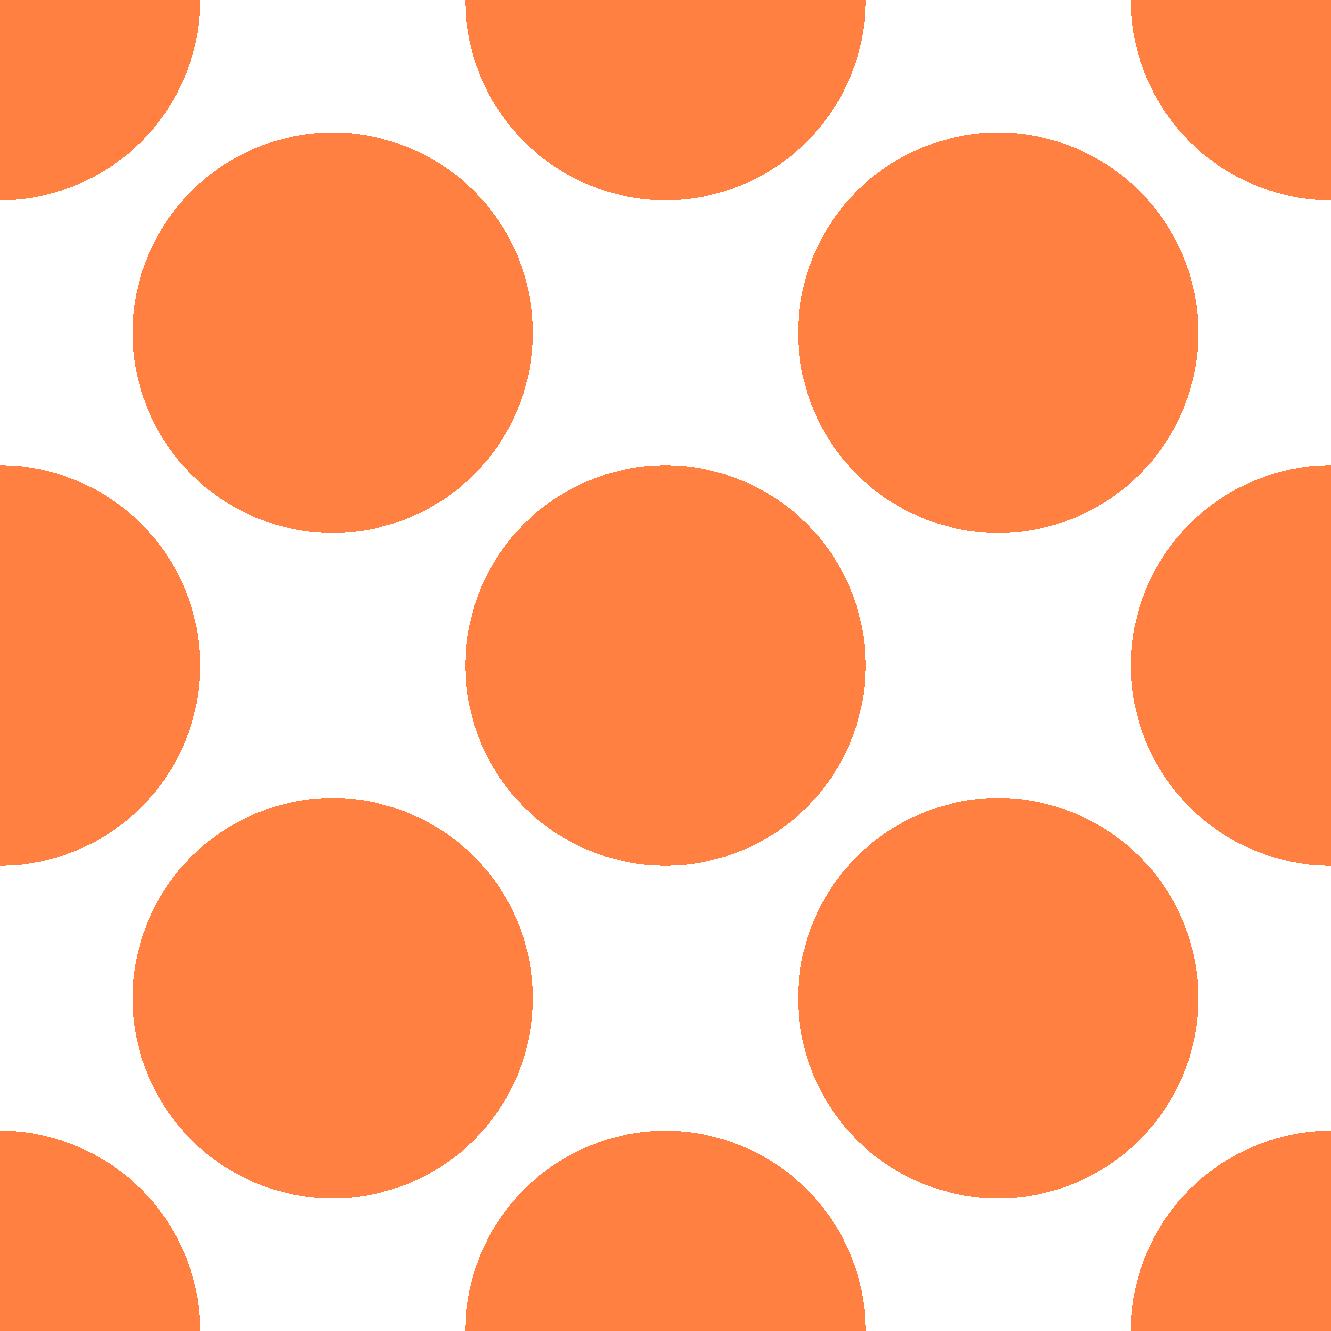 Dot Com Clipart | Clipart .